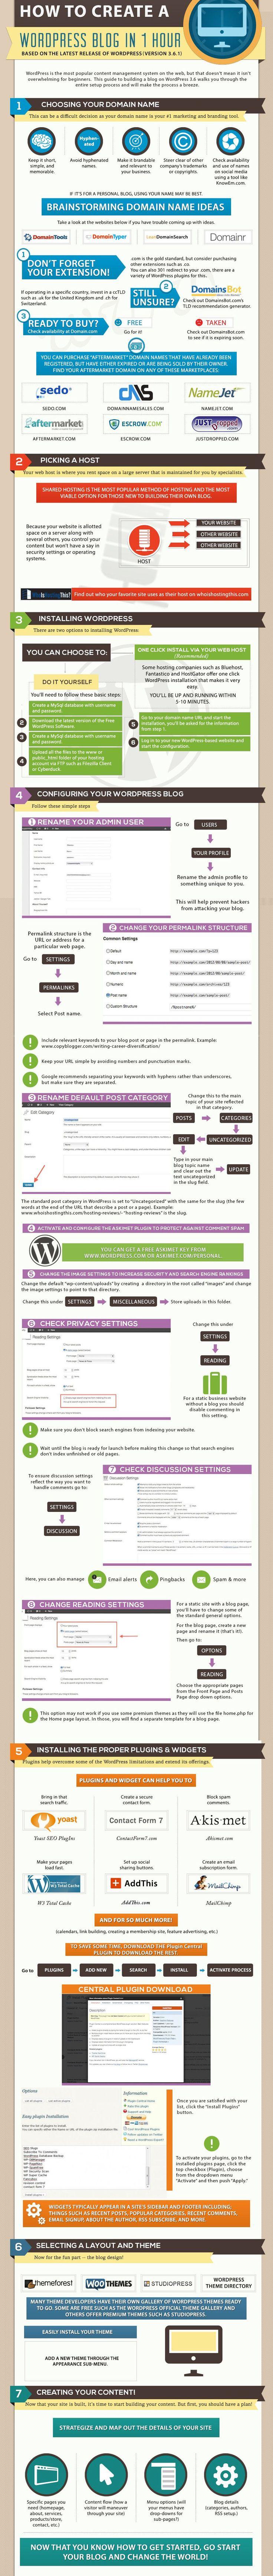 16537 best Wordpress images on Pinterest   Wordpress, Blogging and ...